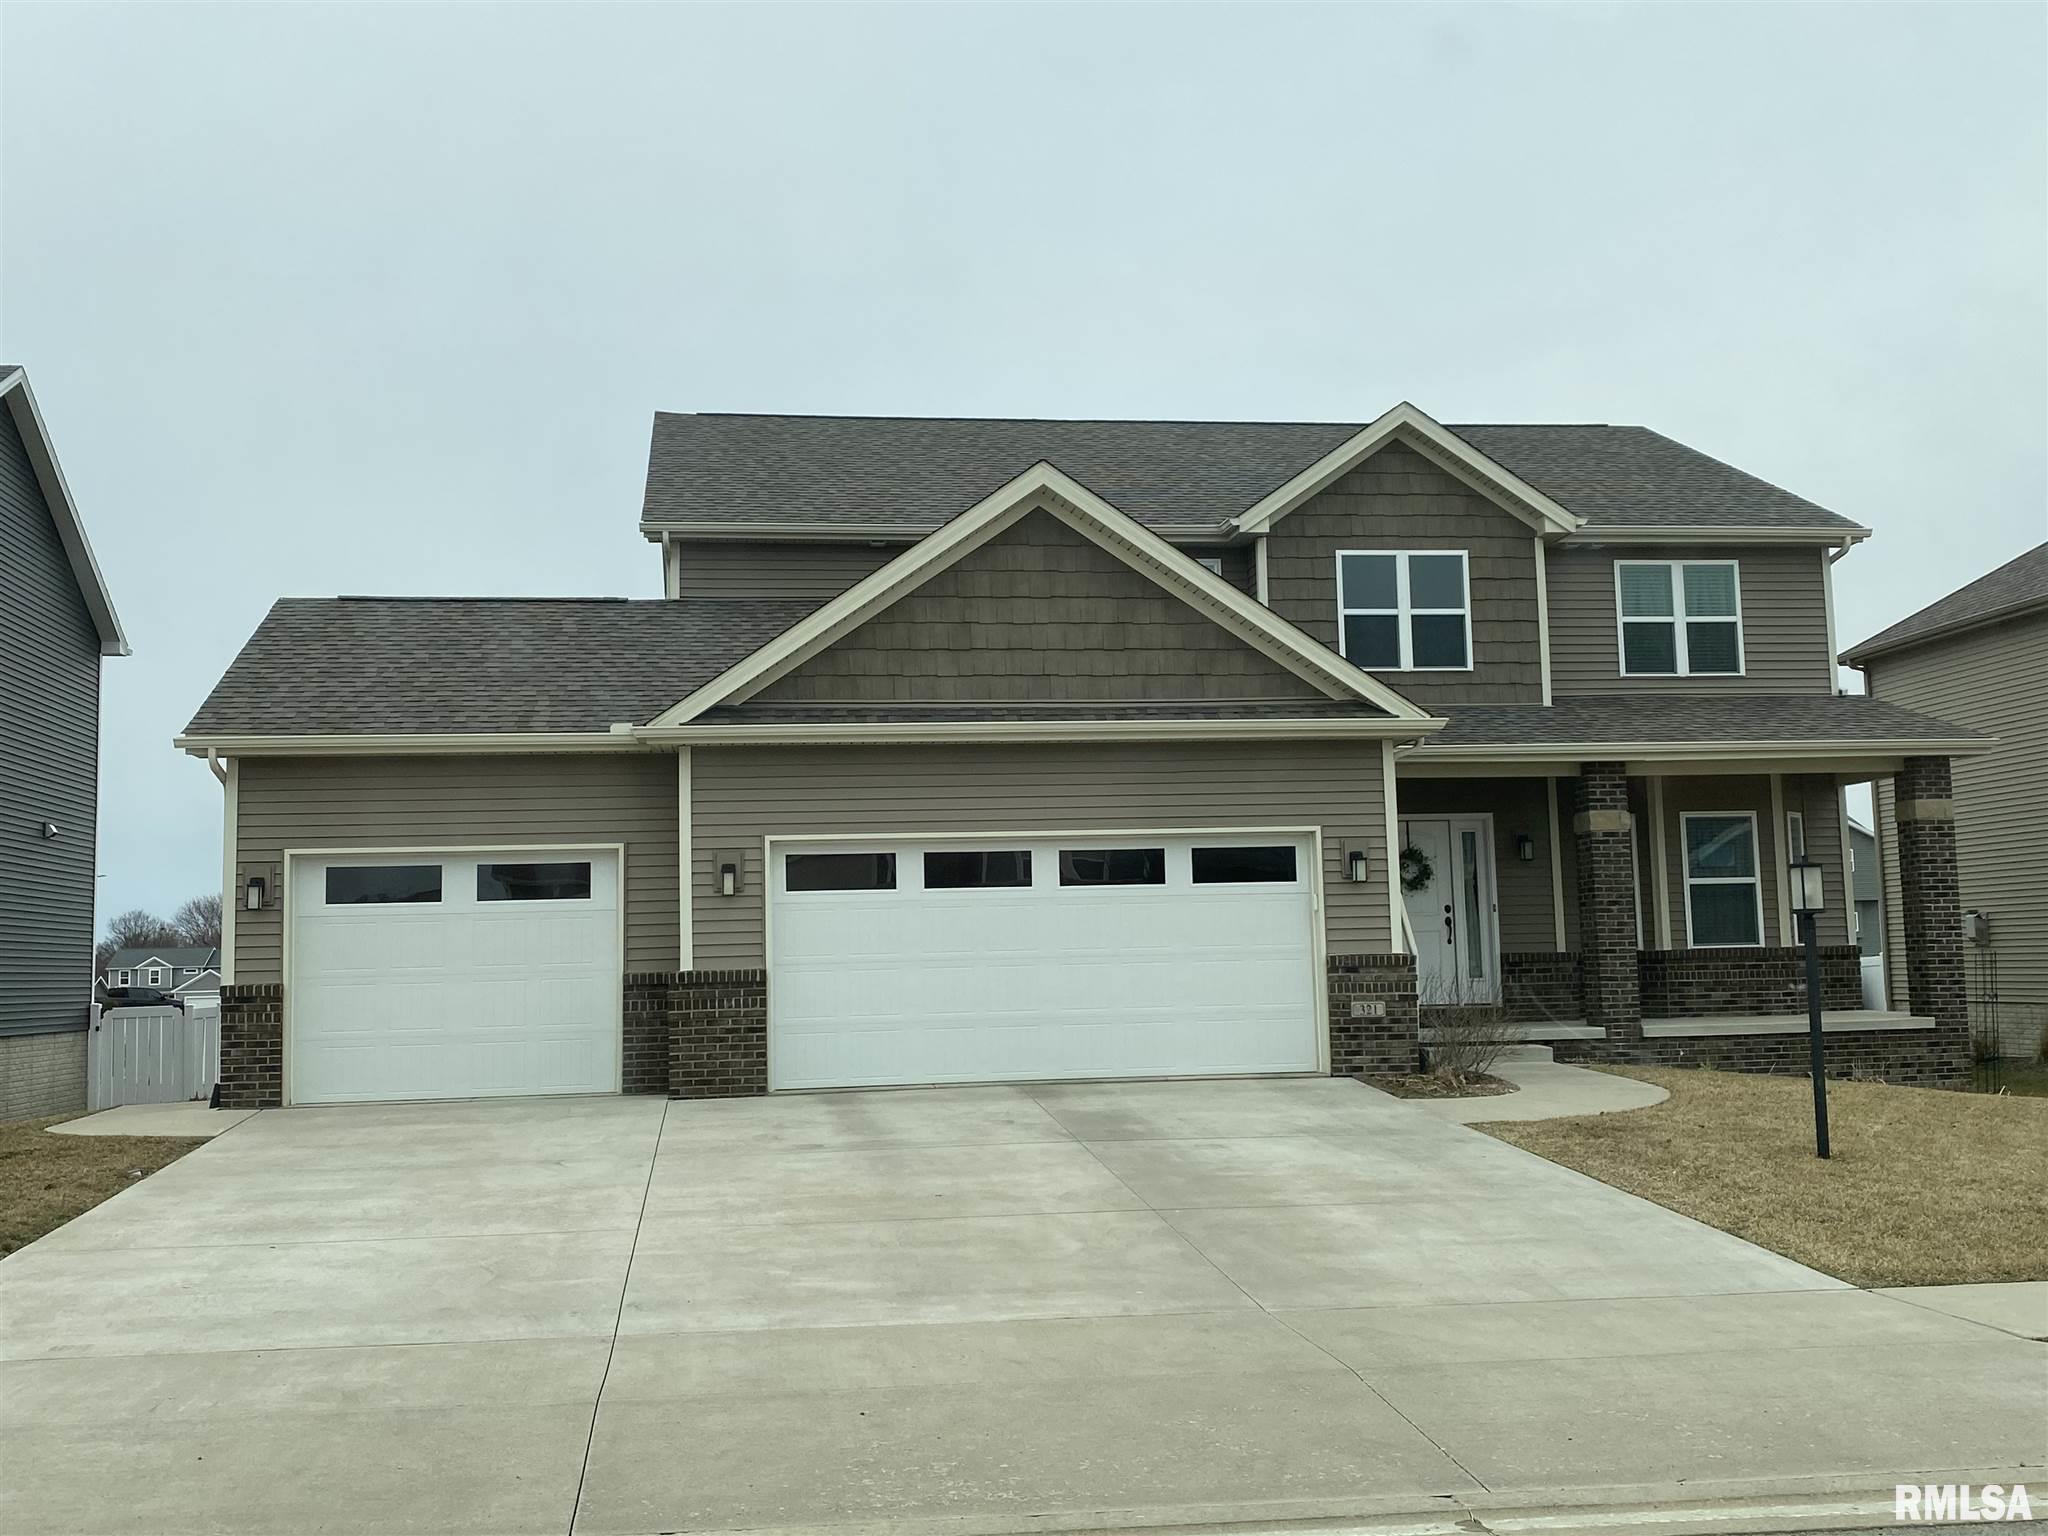 321 N PENNSYLVANIA Property Photo - Morton, IL real estate listing